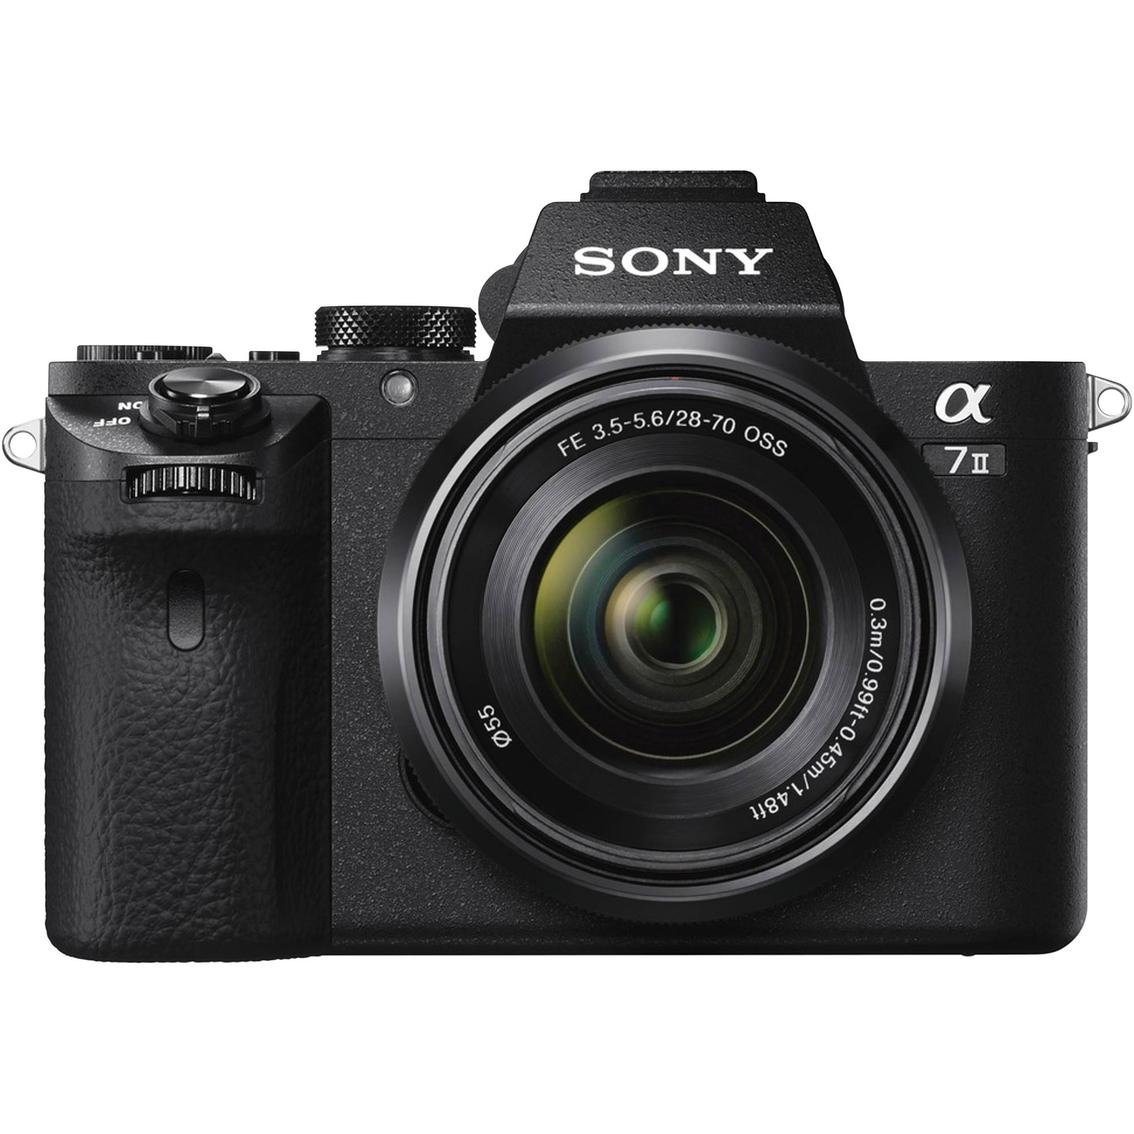 Sony A7 Ii 24.3mp Full-frame Mirrorless Camera + Sel2870 Lens ...